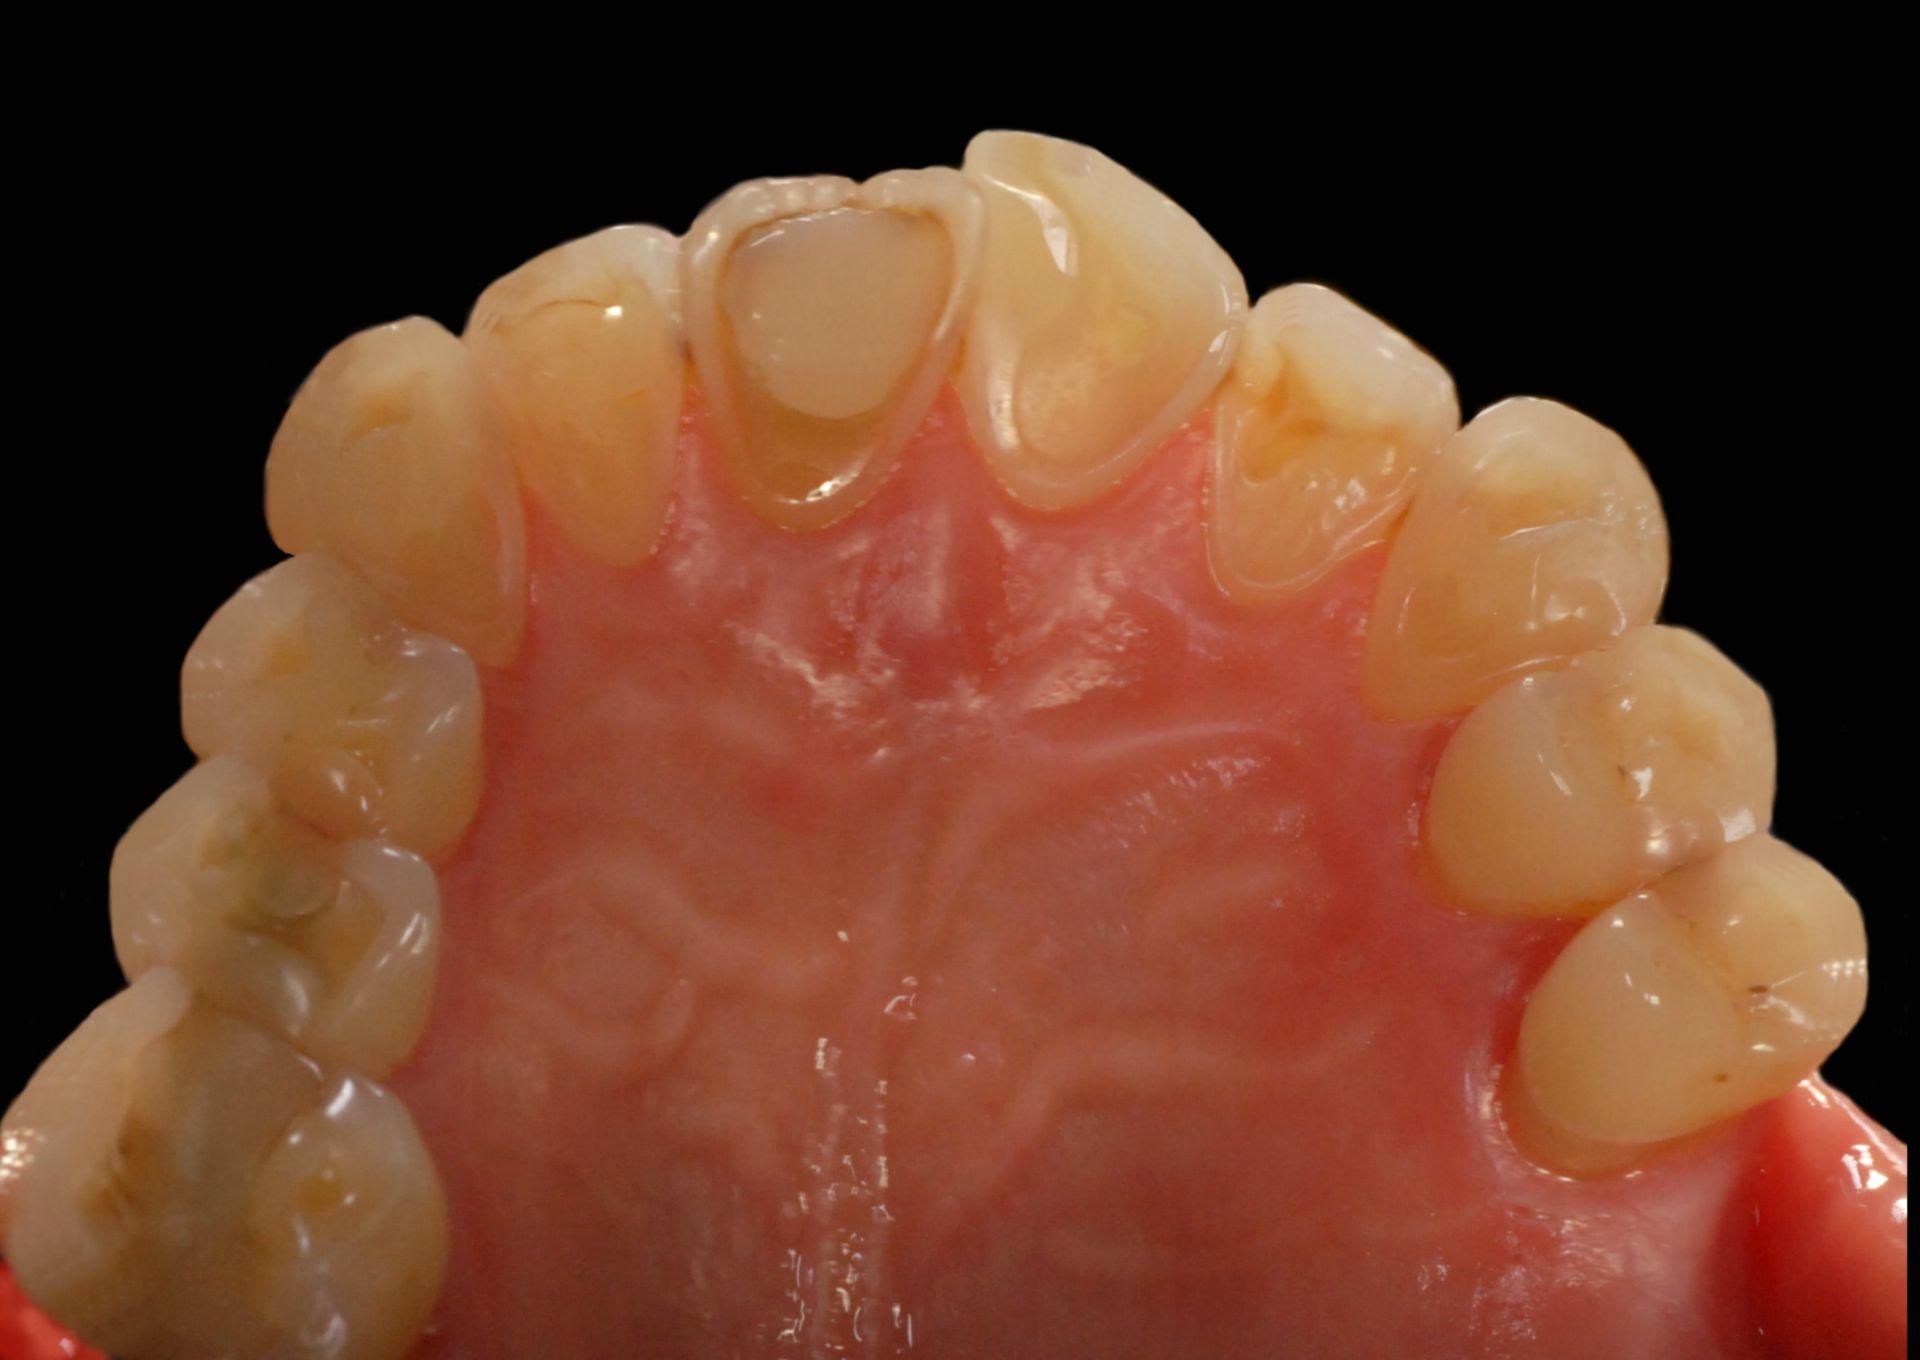 Dental erosions, caused by bulimia